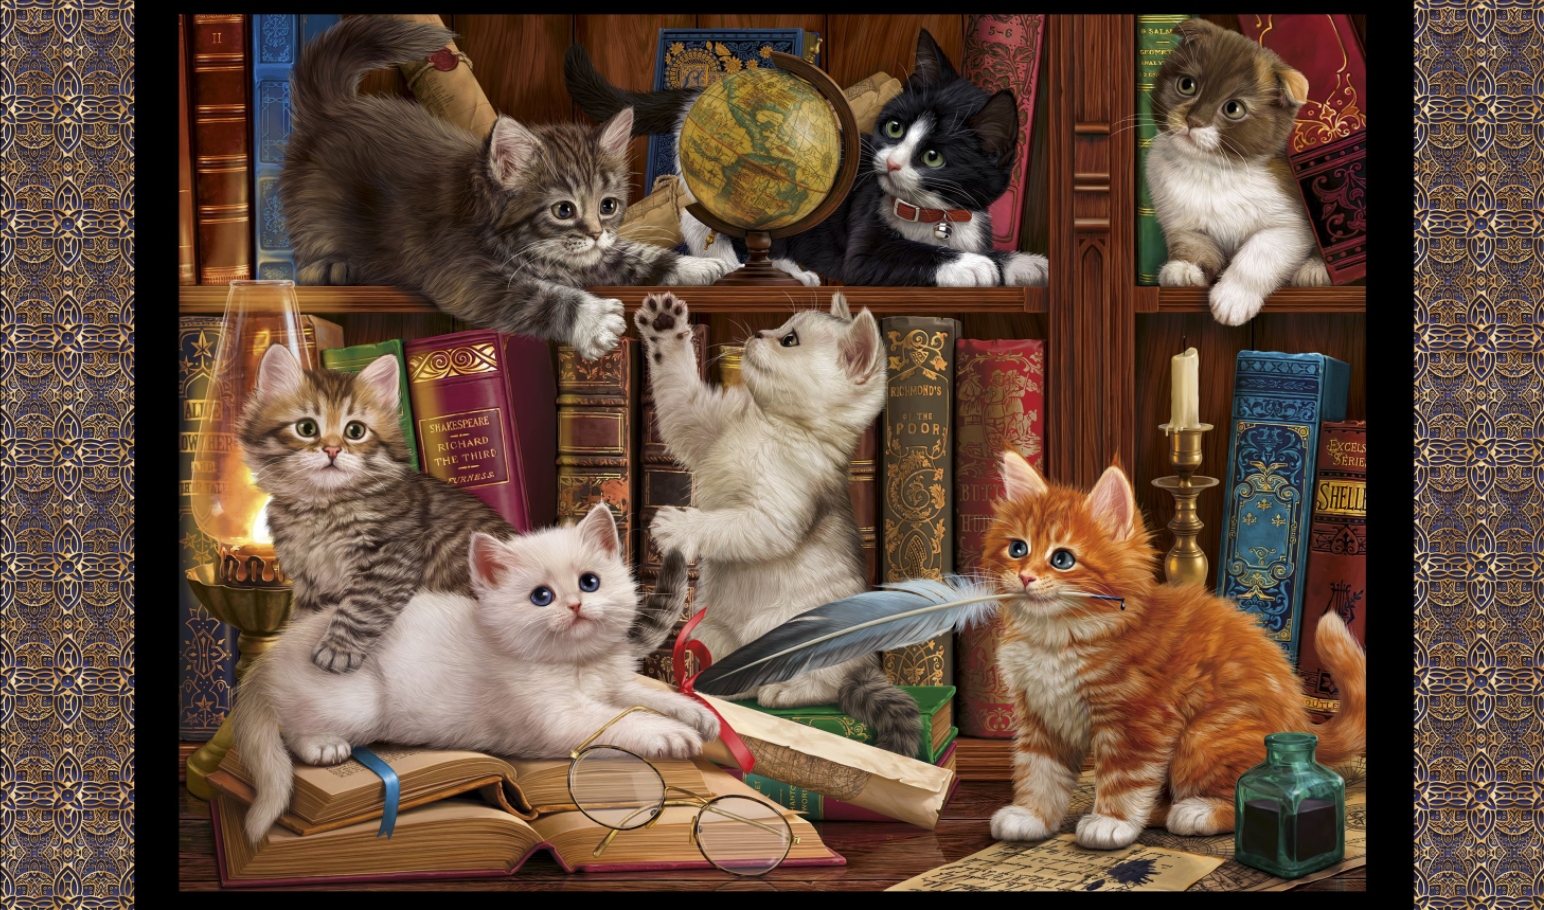 Literary Kitties PANEL by Quilting Treasures (1649-28235-J)